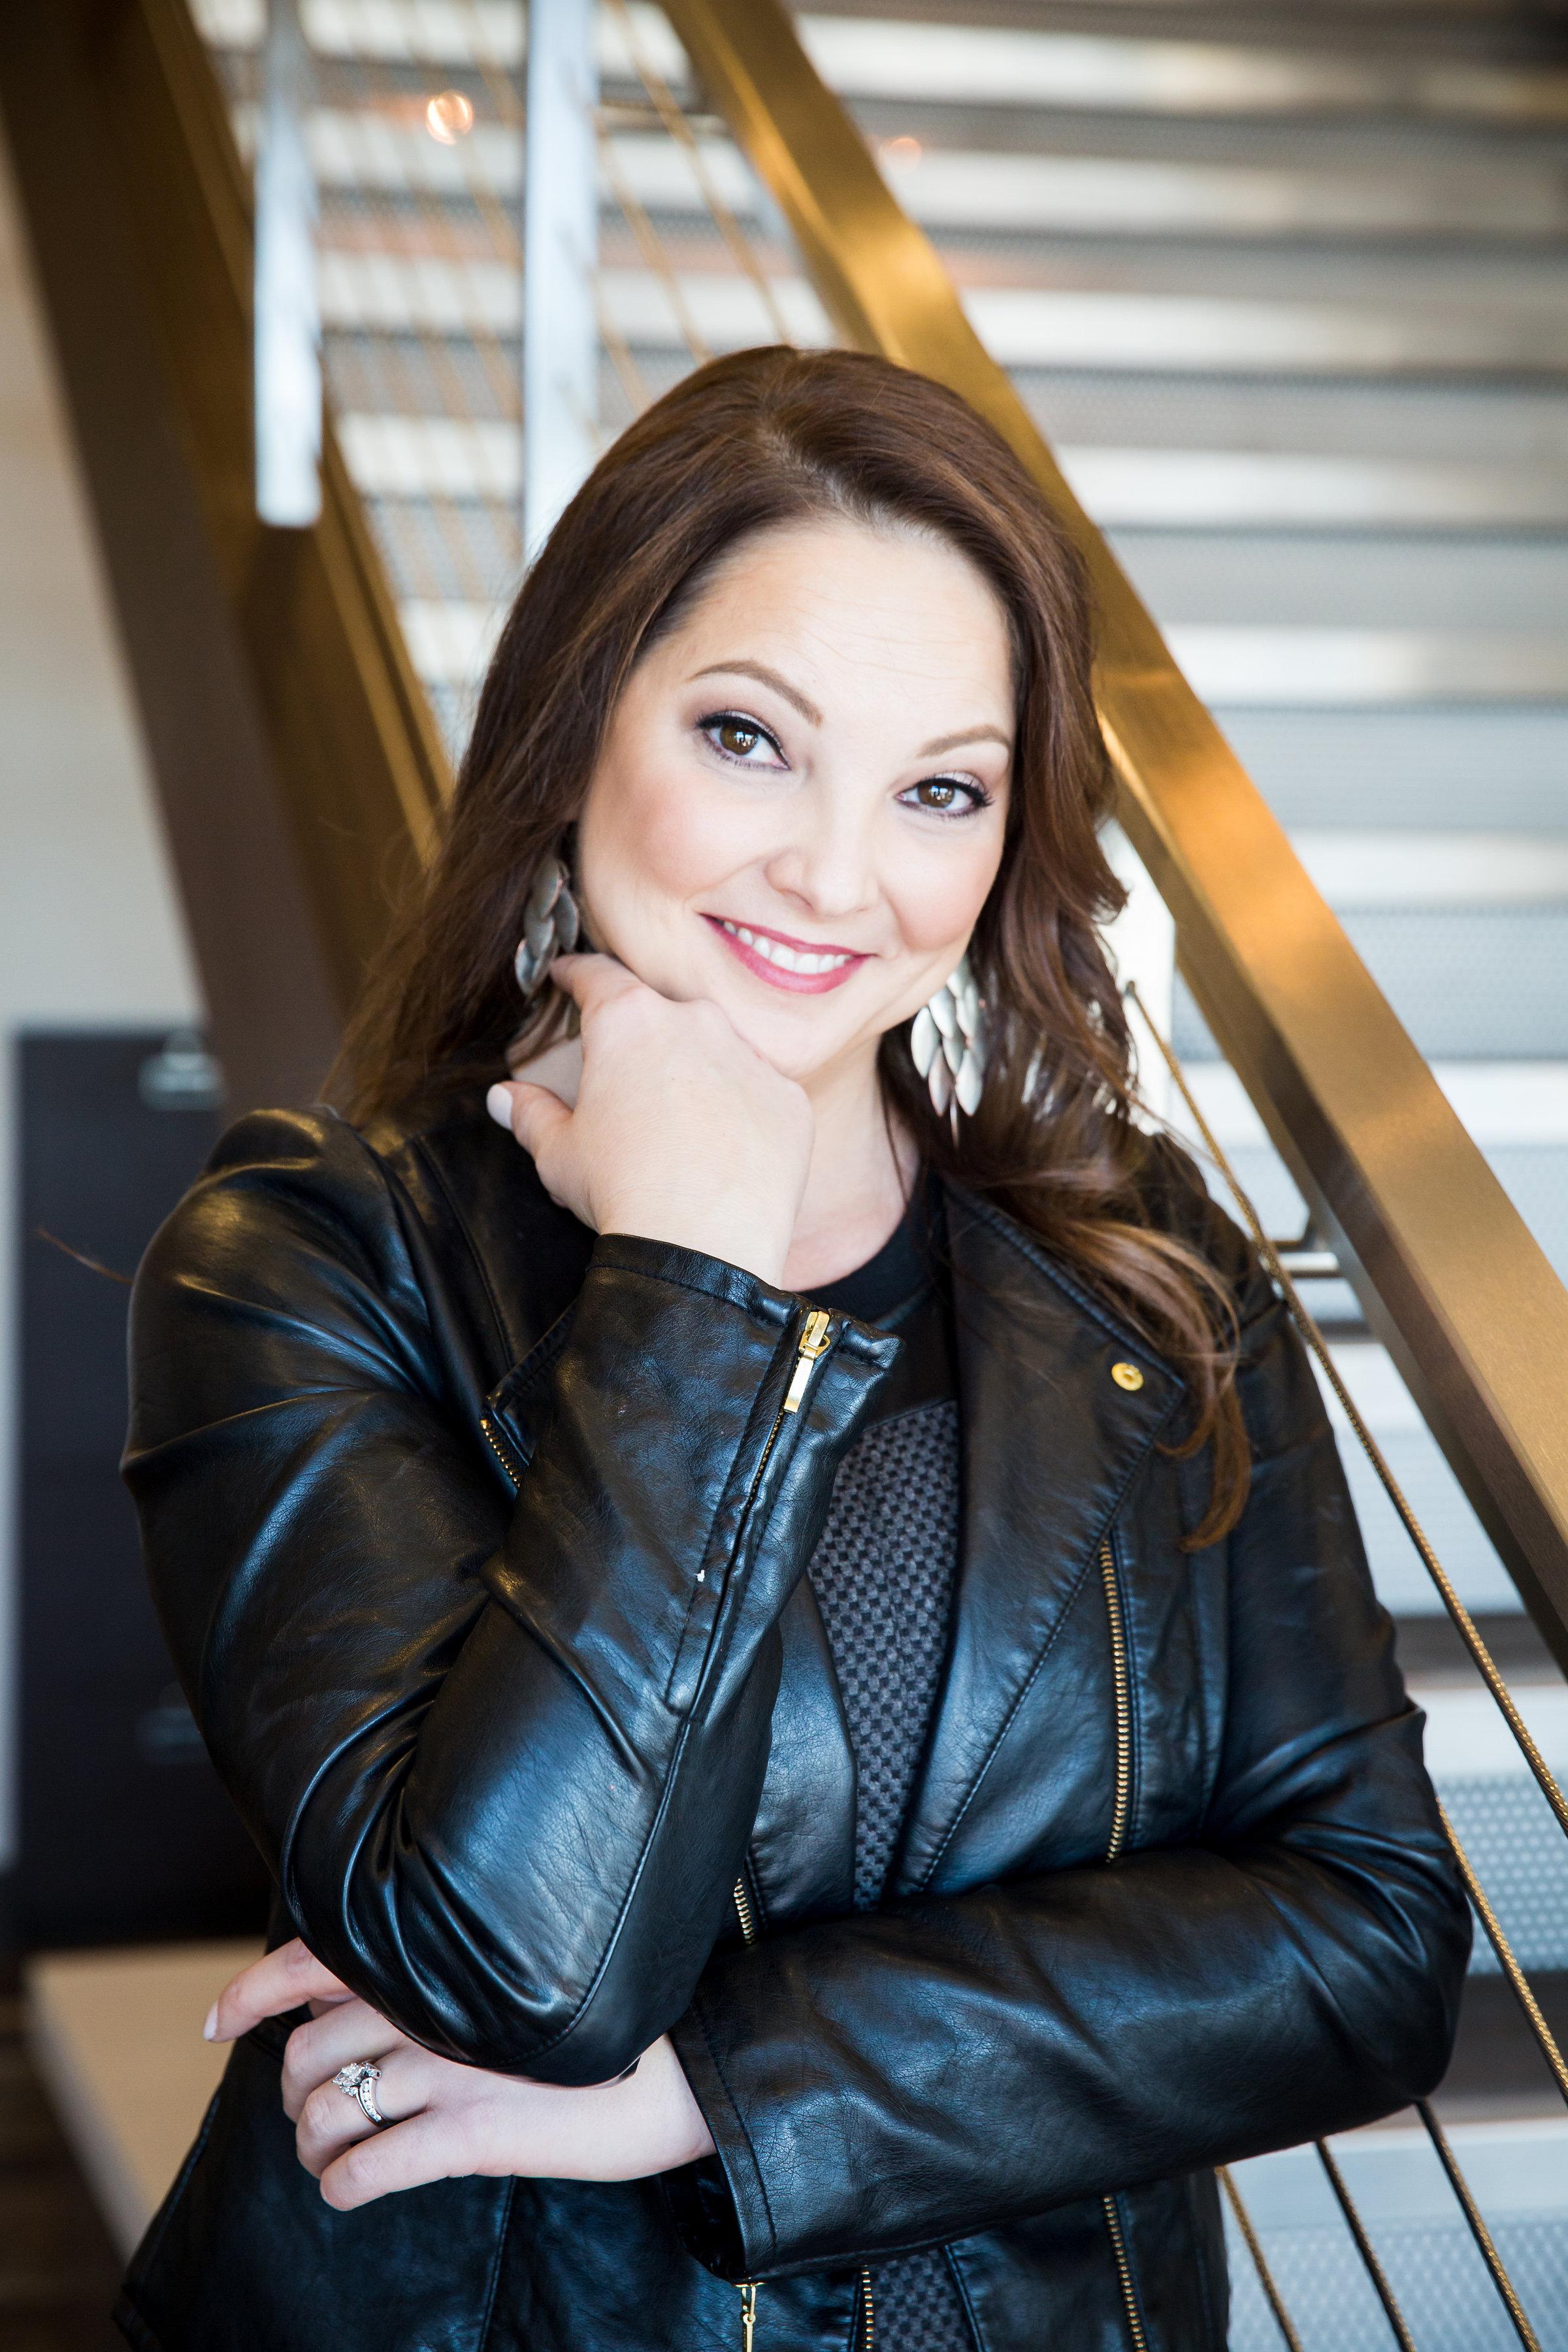 Amber De La Garza